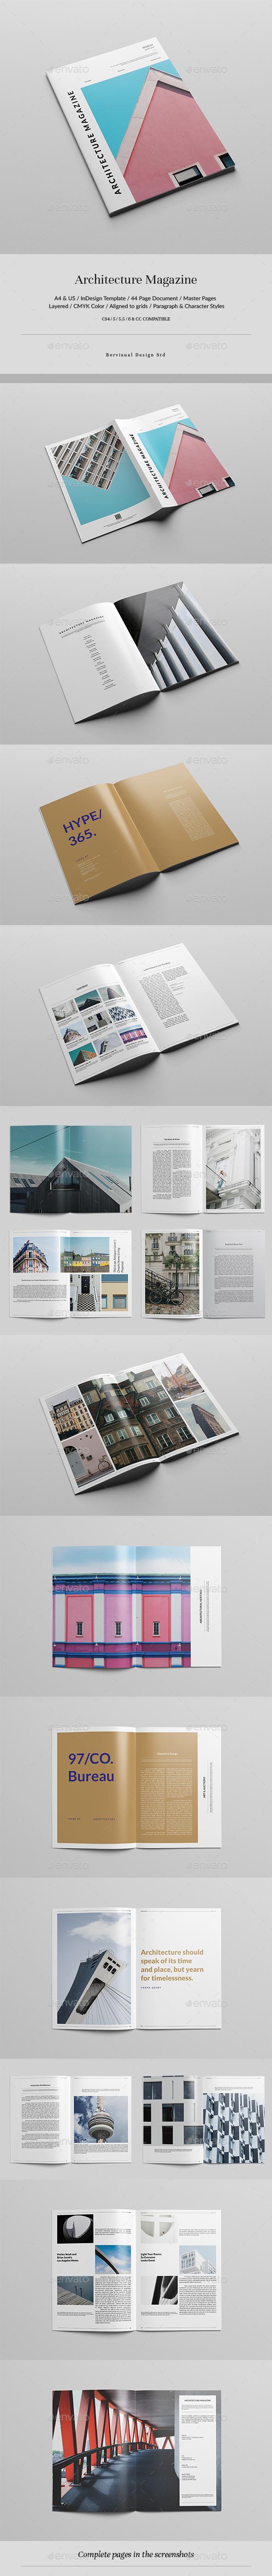 Architecture Magazine - Magazines Print Templates